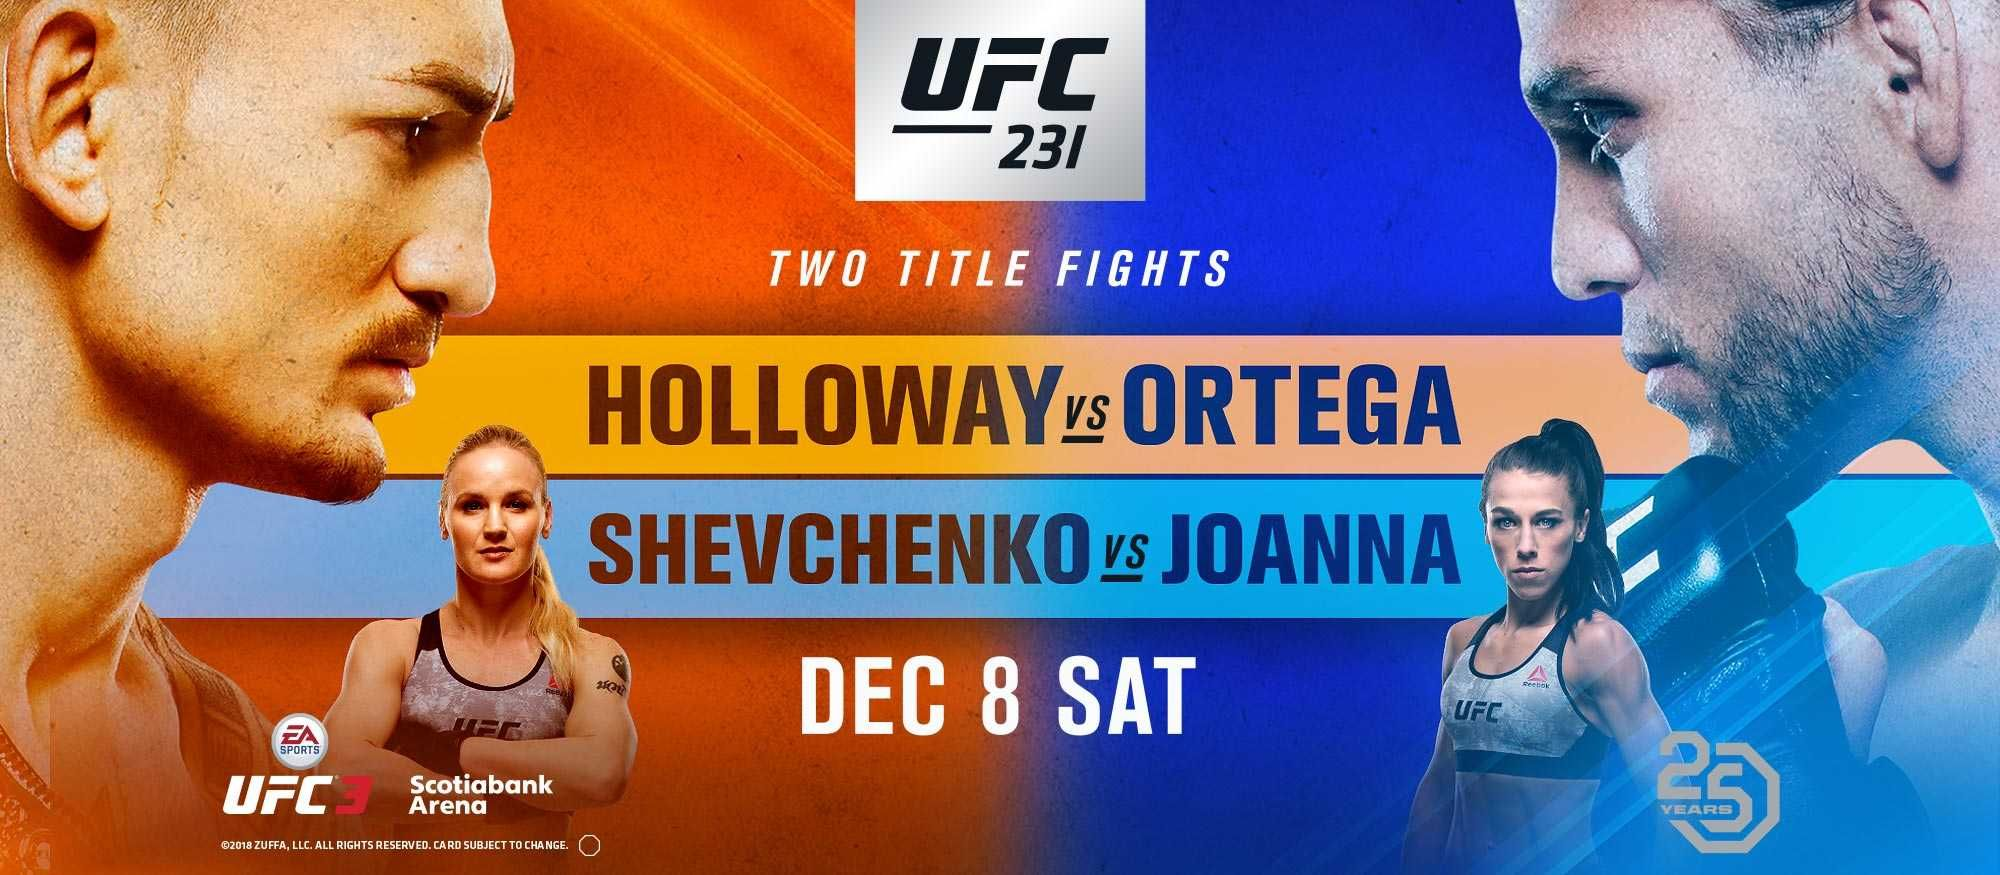 Ufc 231 Holloway Vs Ortega Ufc Ufc Live Sports Predictions